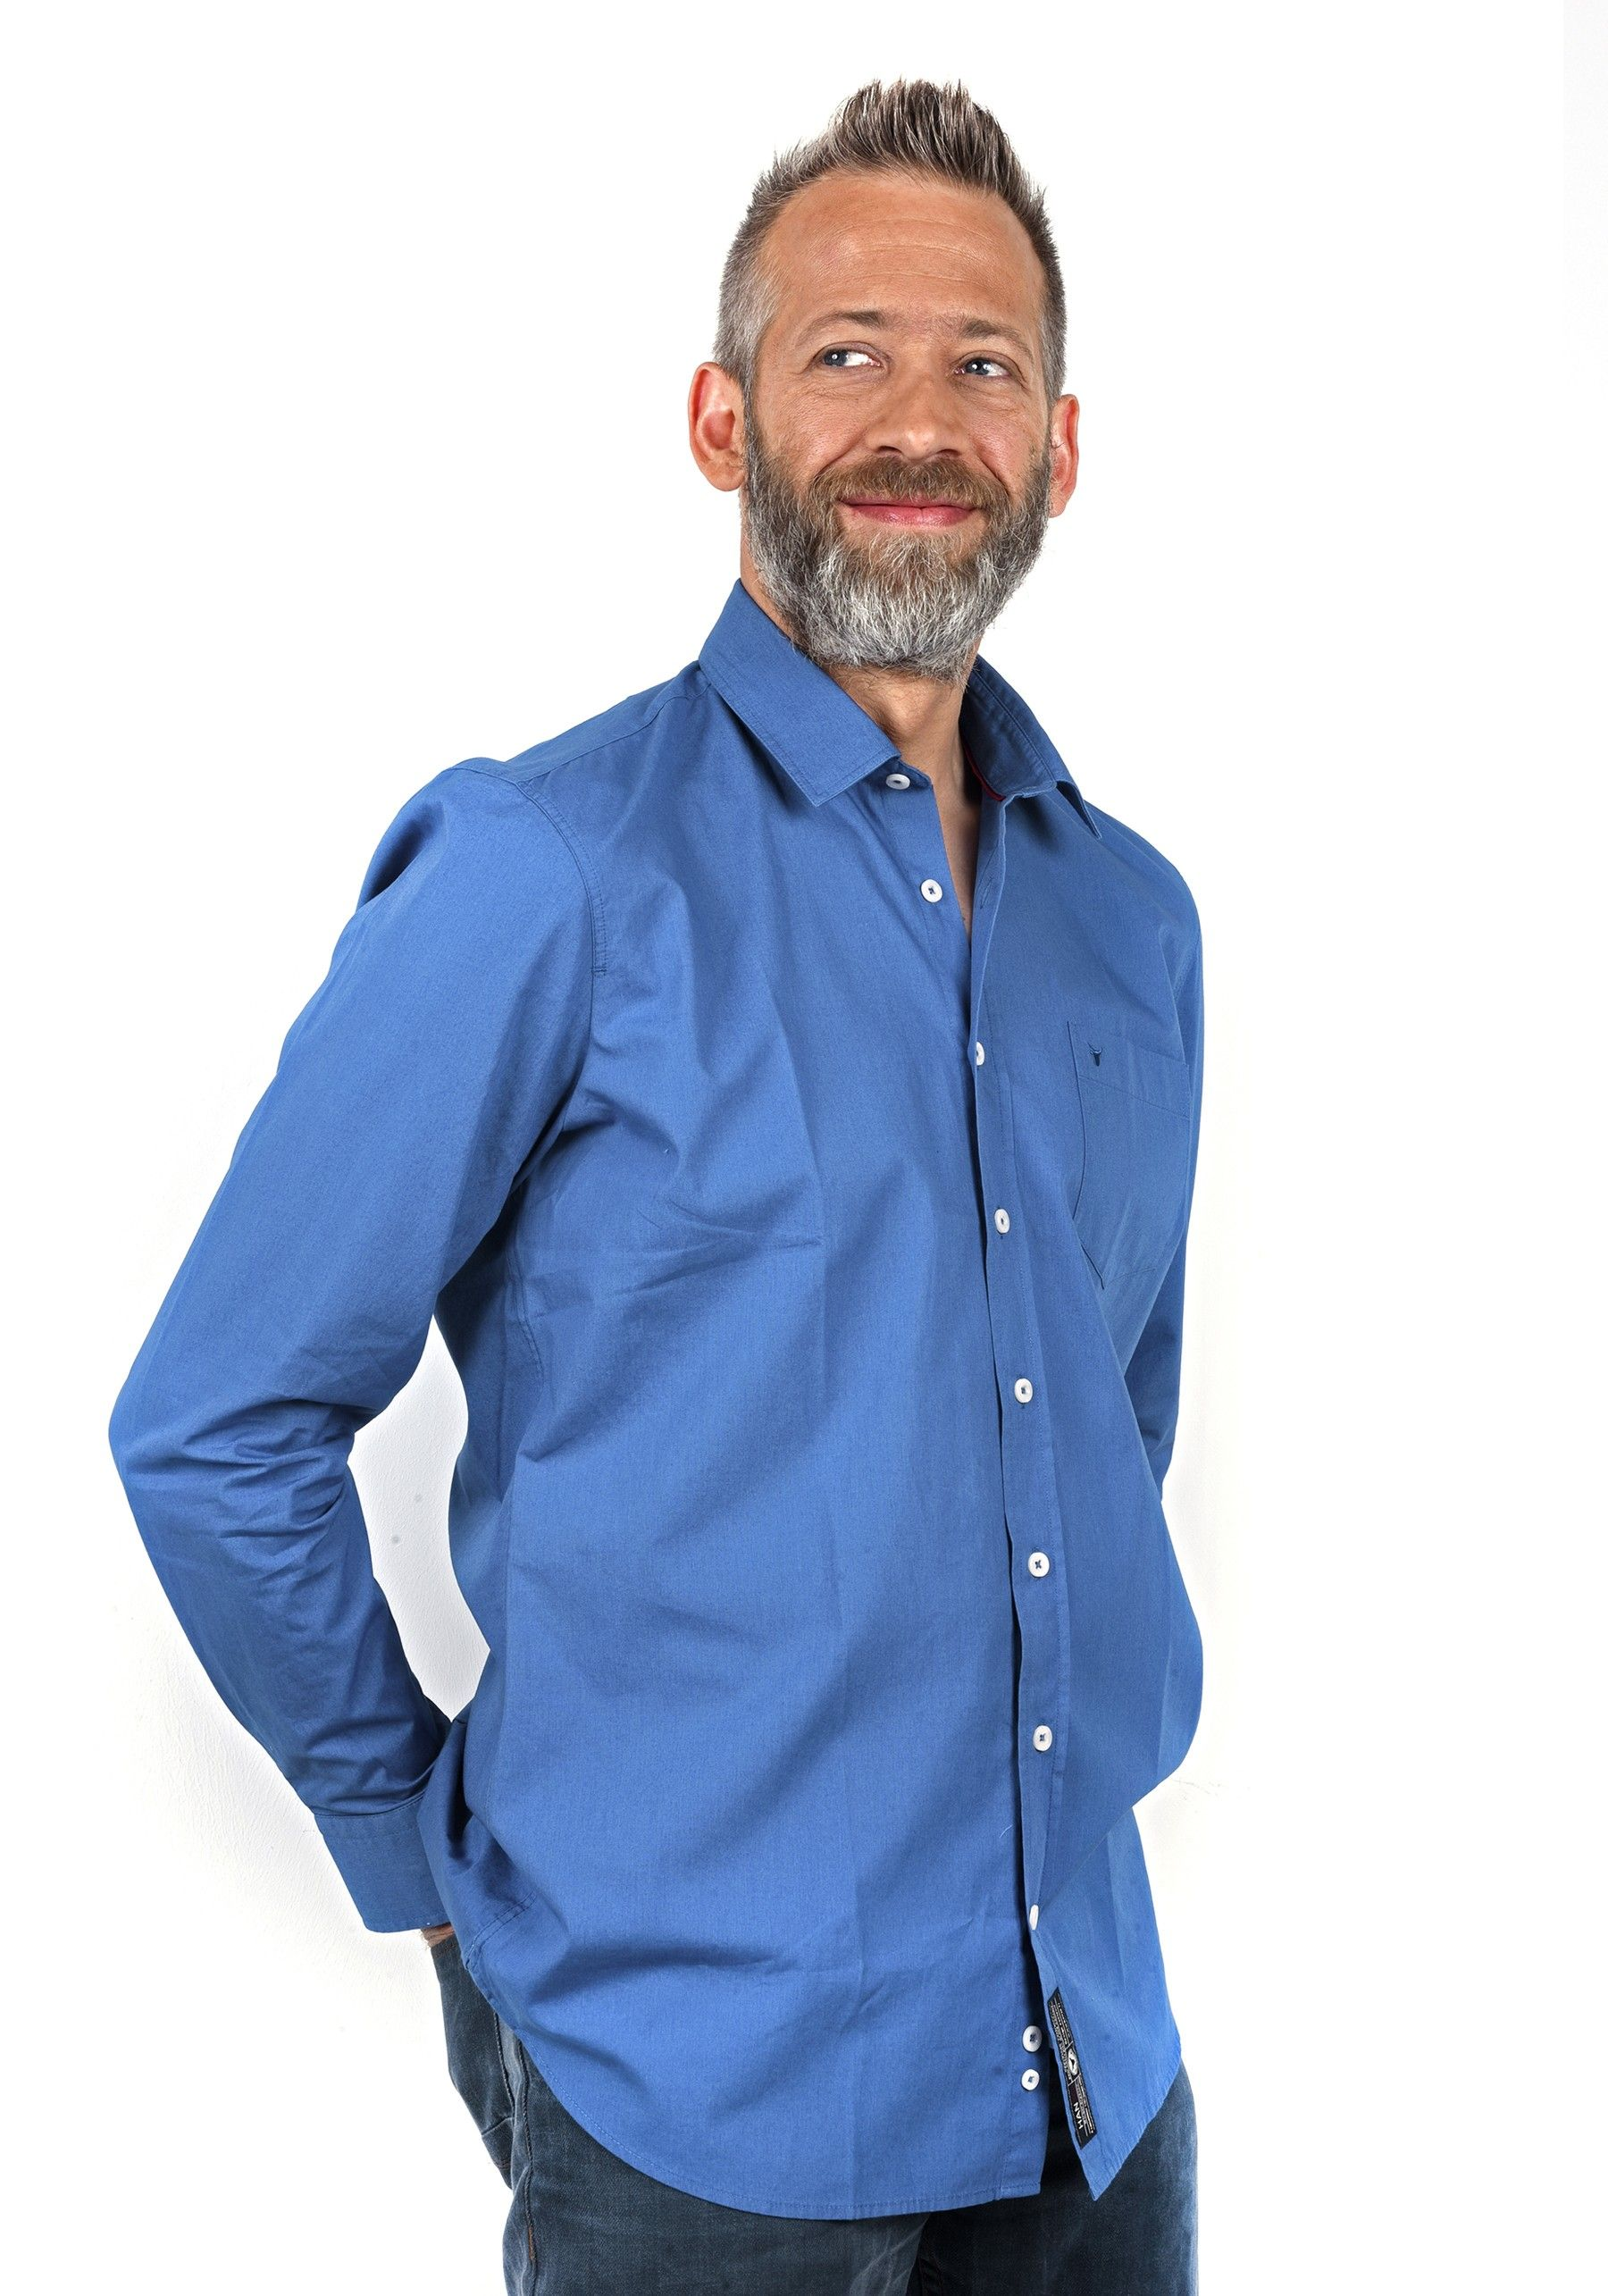 Chemise Style Homme Coton Uni Mode 100 Popeline Bleu Royal TBrqpT